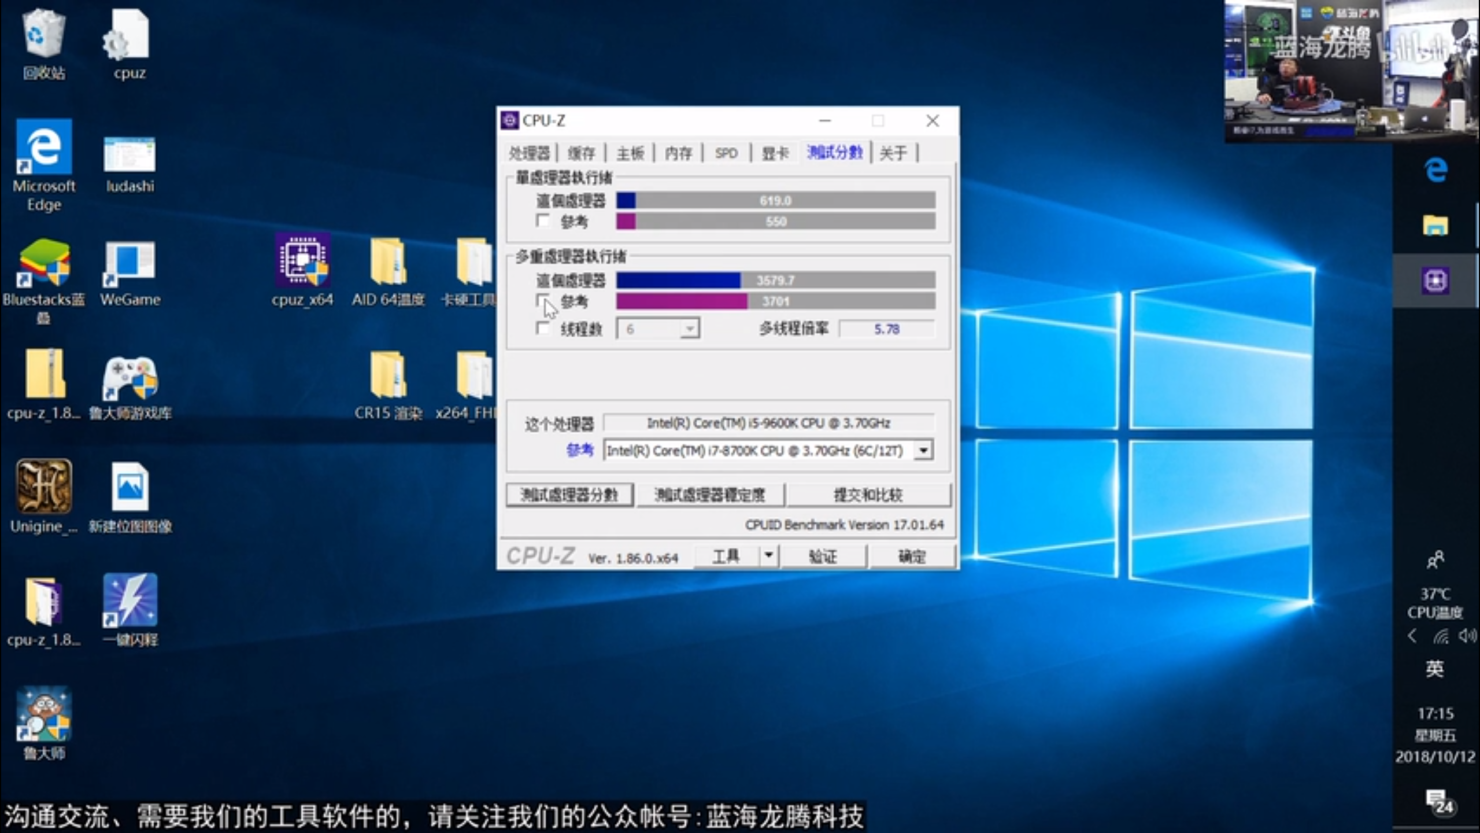 intel-core-i5-9600k-cpu-benchmarks_oc_2